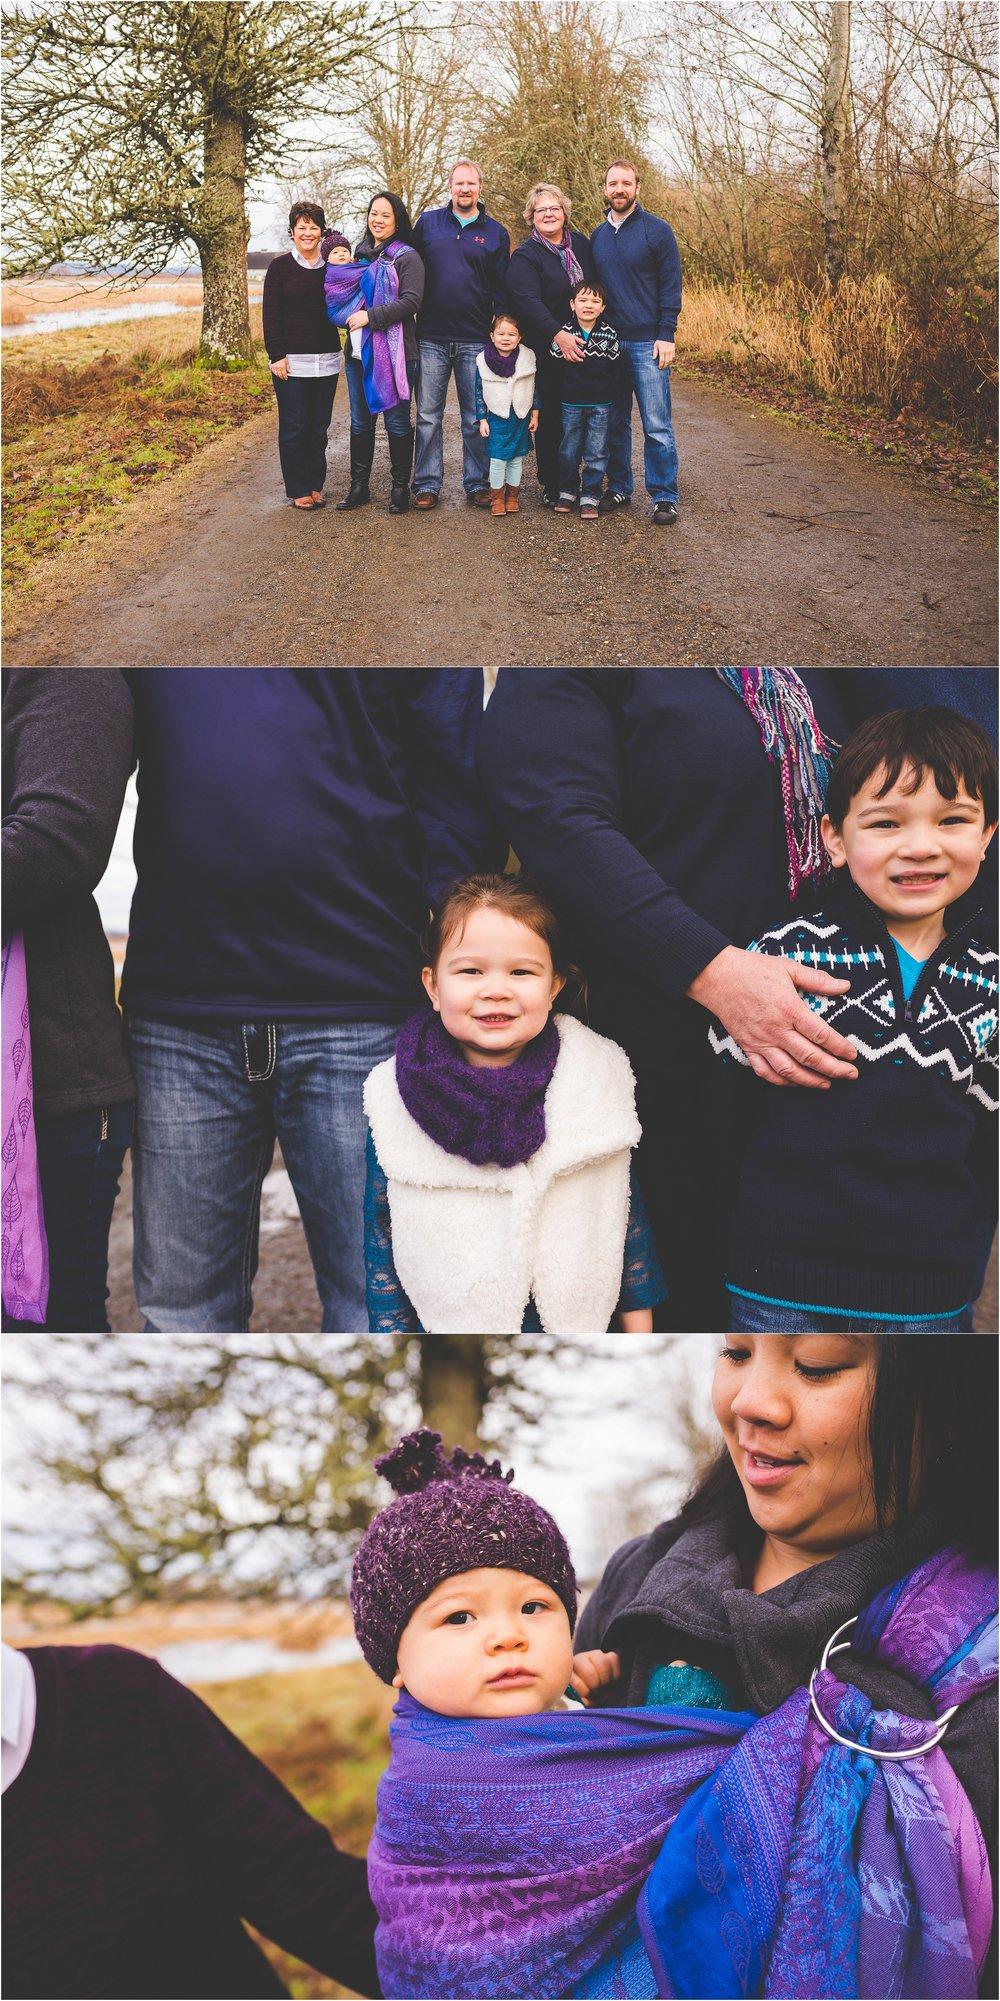 nisqually-wildlife-refuge-family-session-jannicka-mayte-olympia-wa-family-photographer_0001.jpg